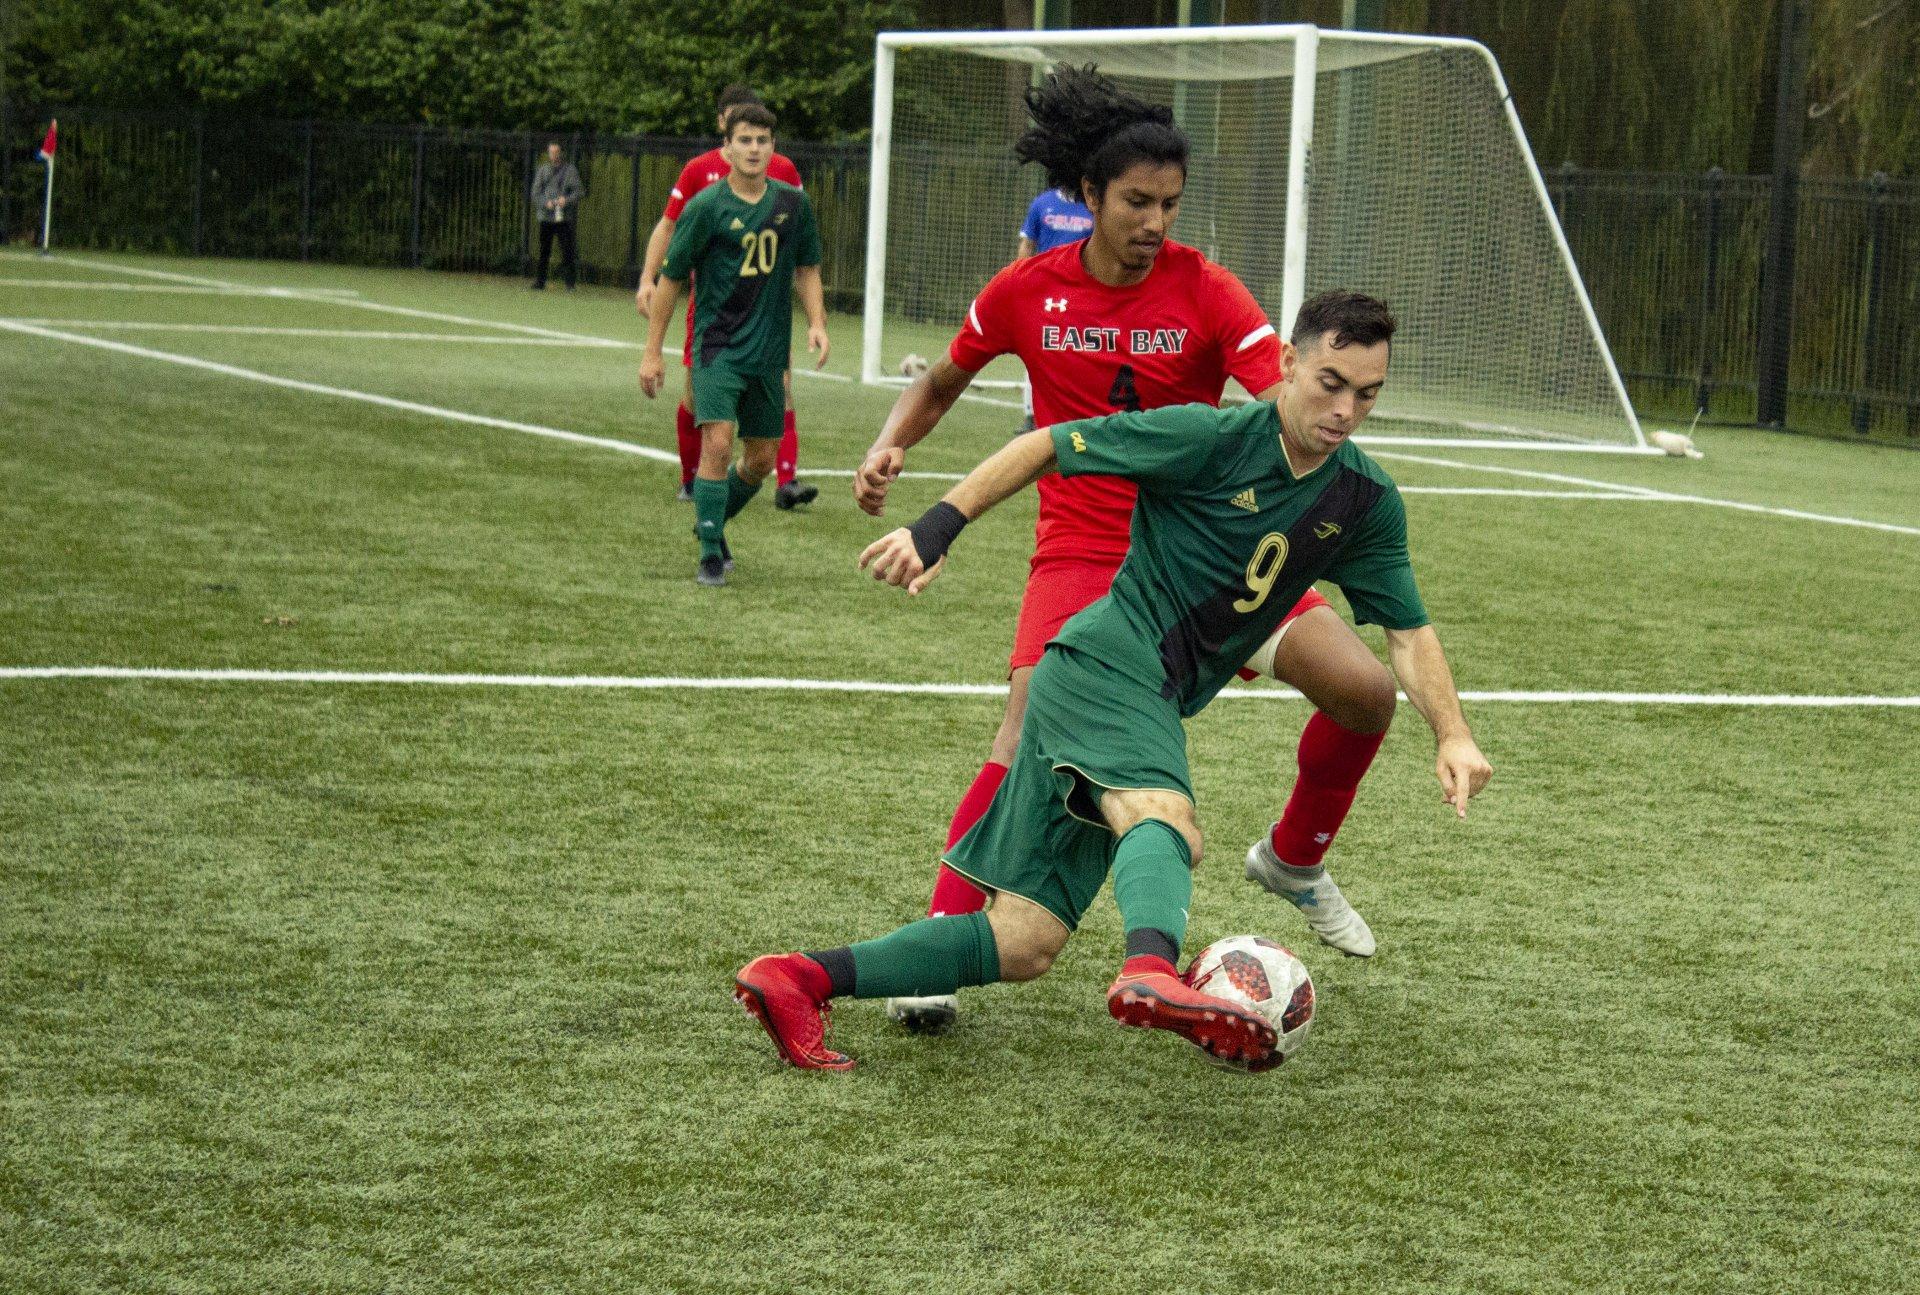 AS.soccerHSUSOCCER5